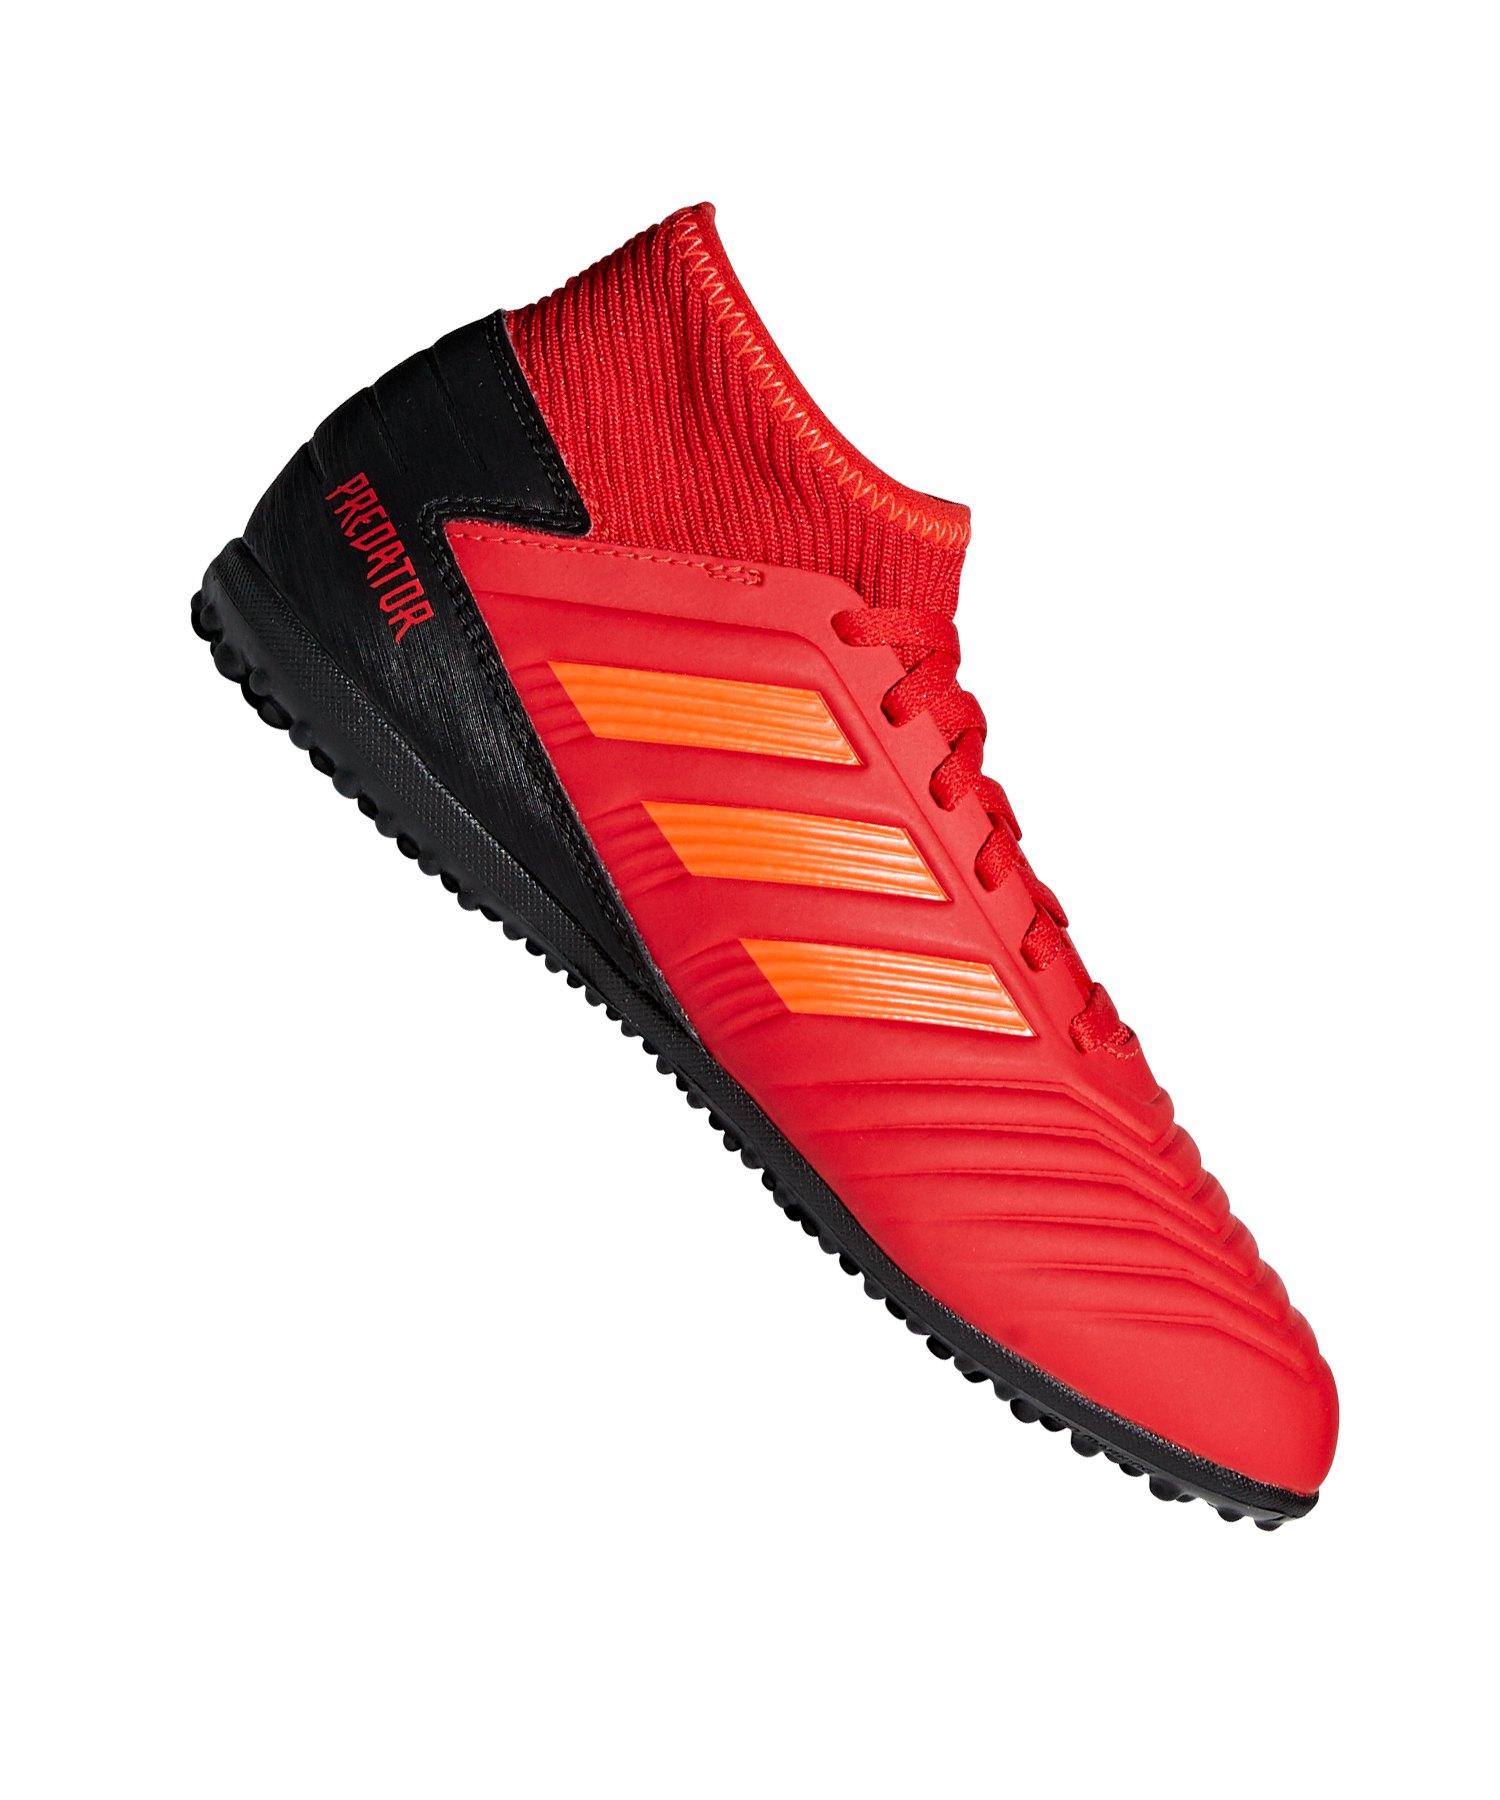 adidas Predator 19.3 TF Kids Rot Schwarz - rot